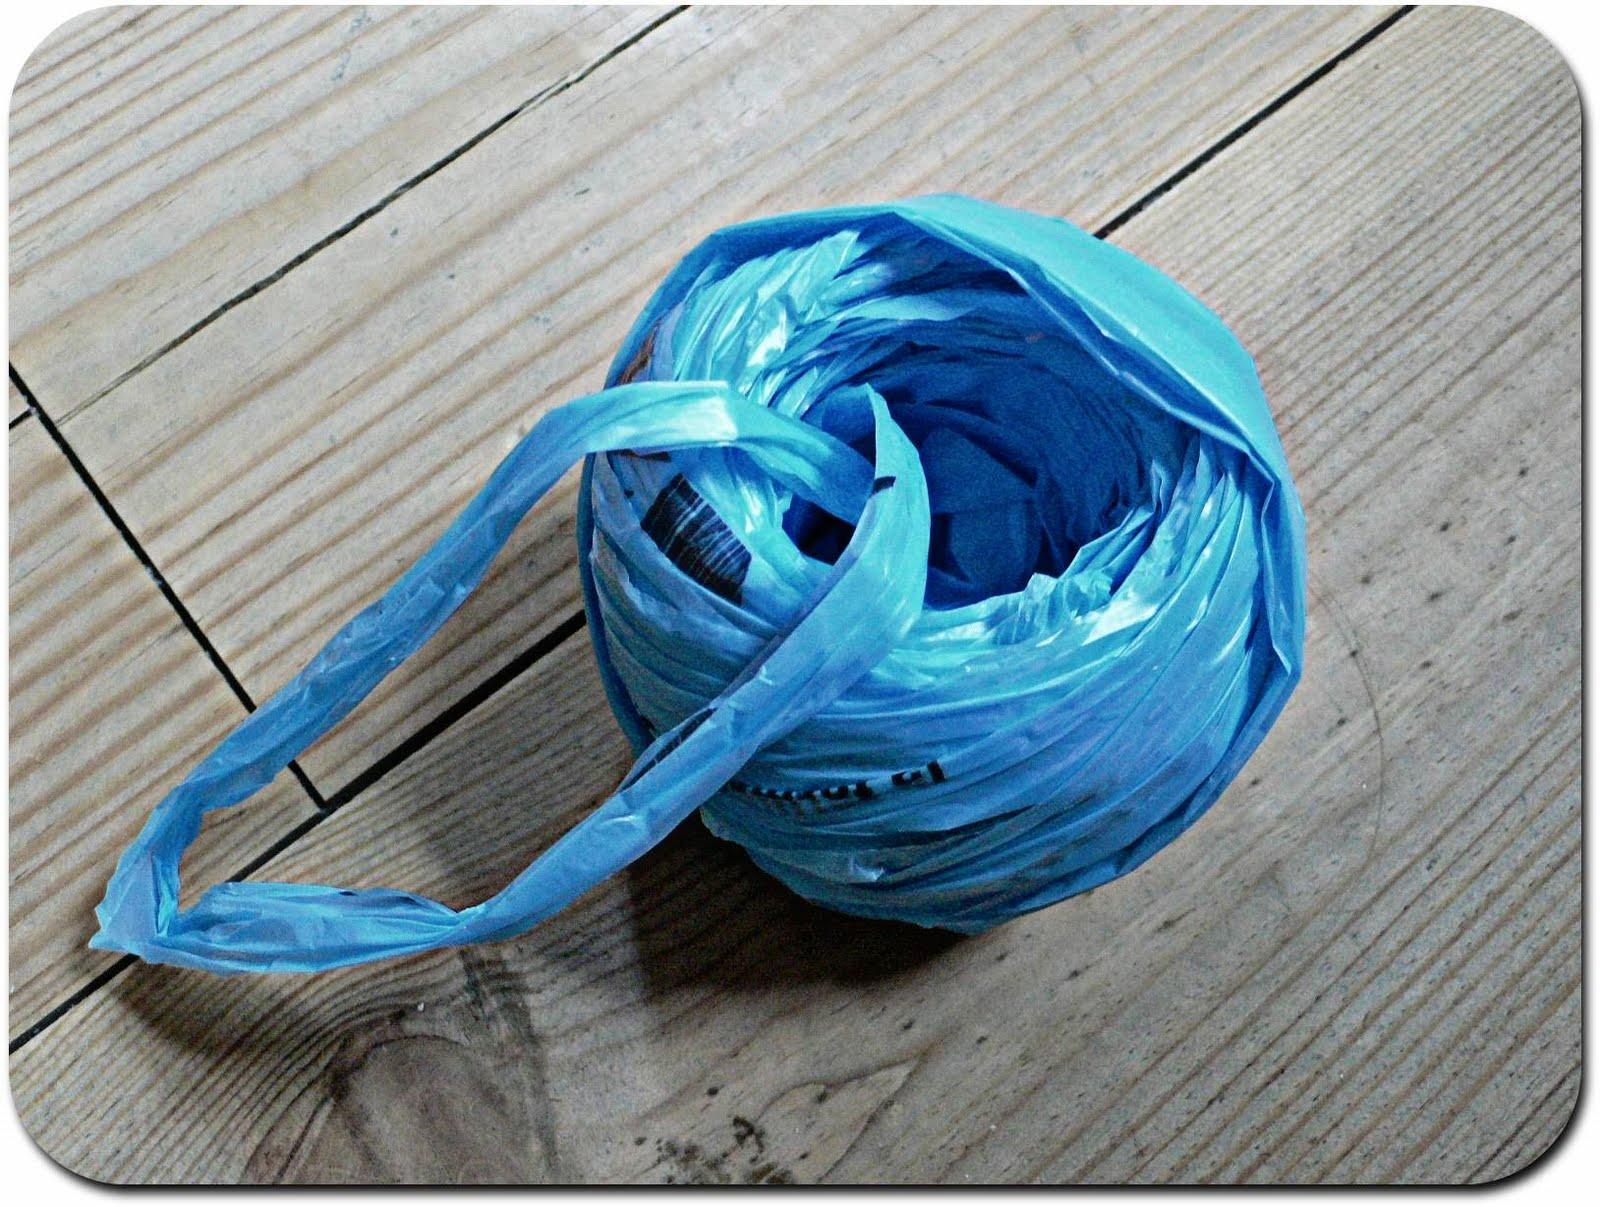 isabelle kessedjian tuto crocheter du plastique. Black Bedroom Furniture Sets. Home Design Ideas